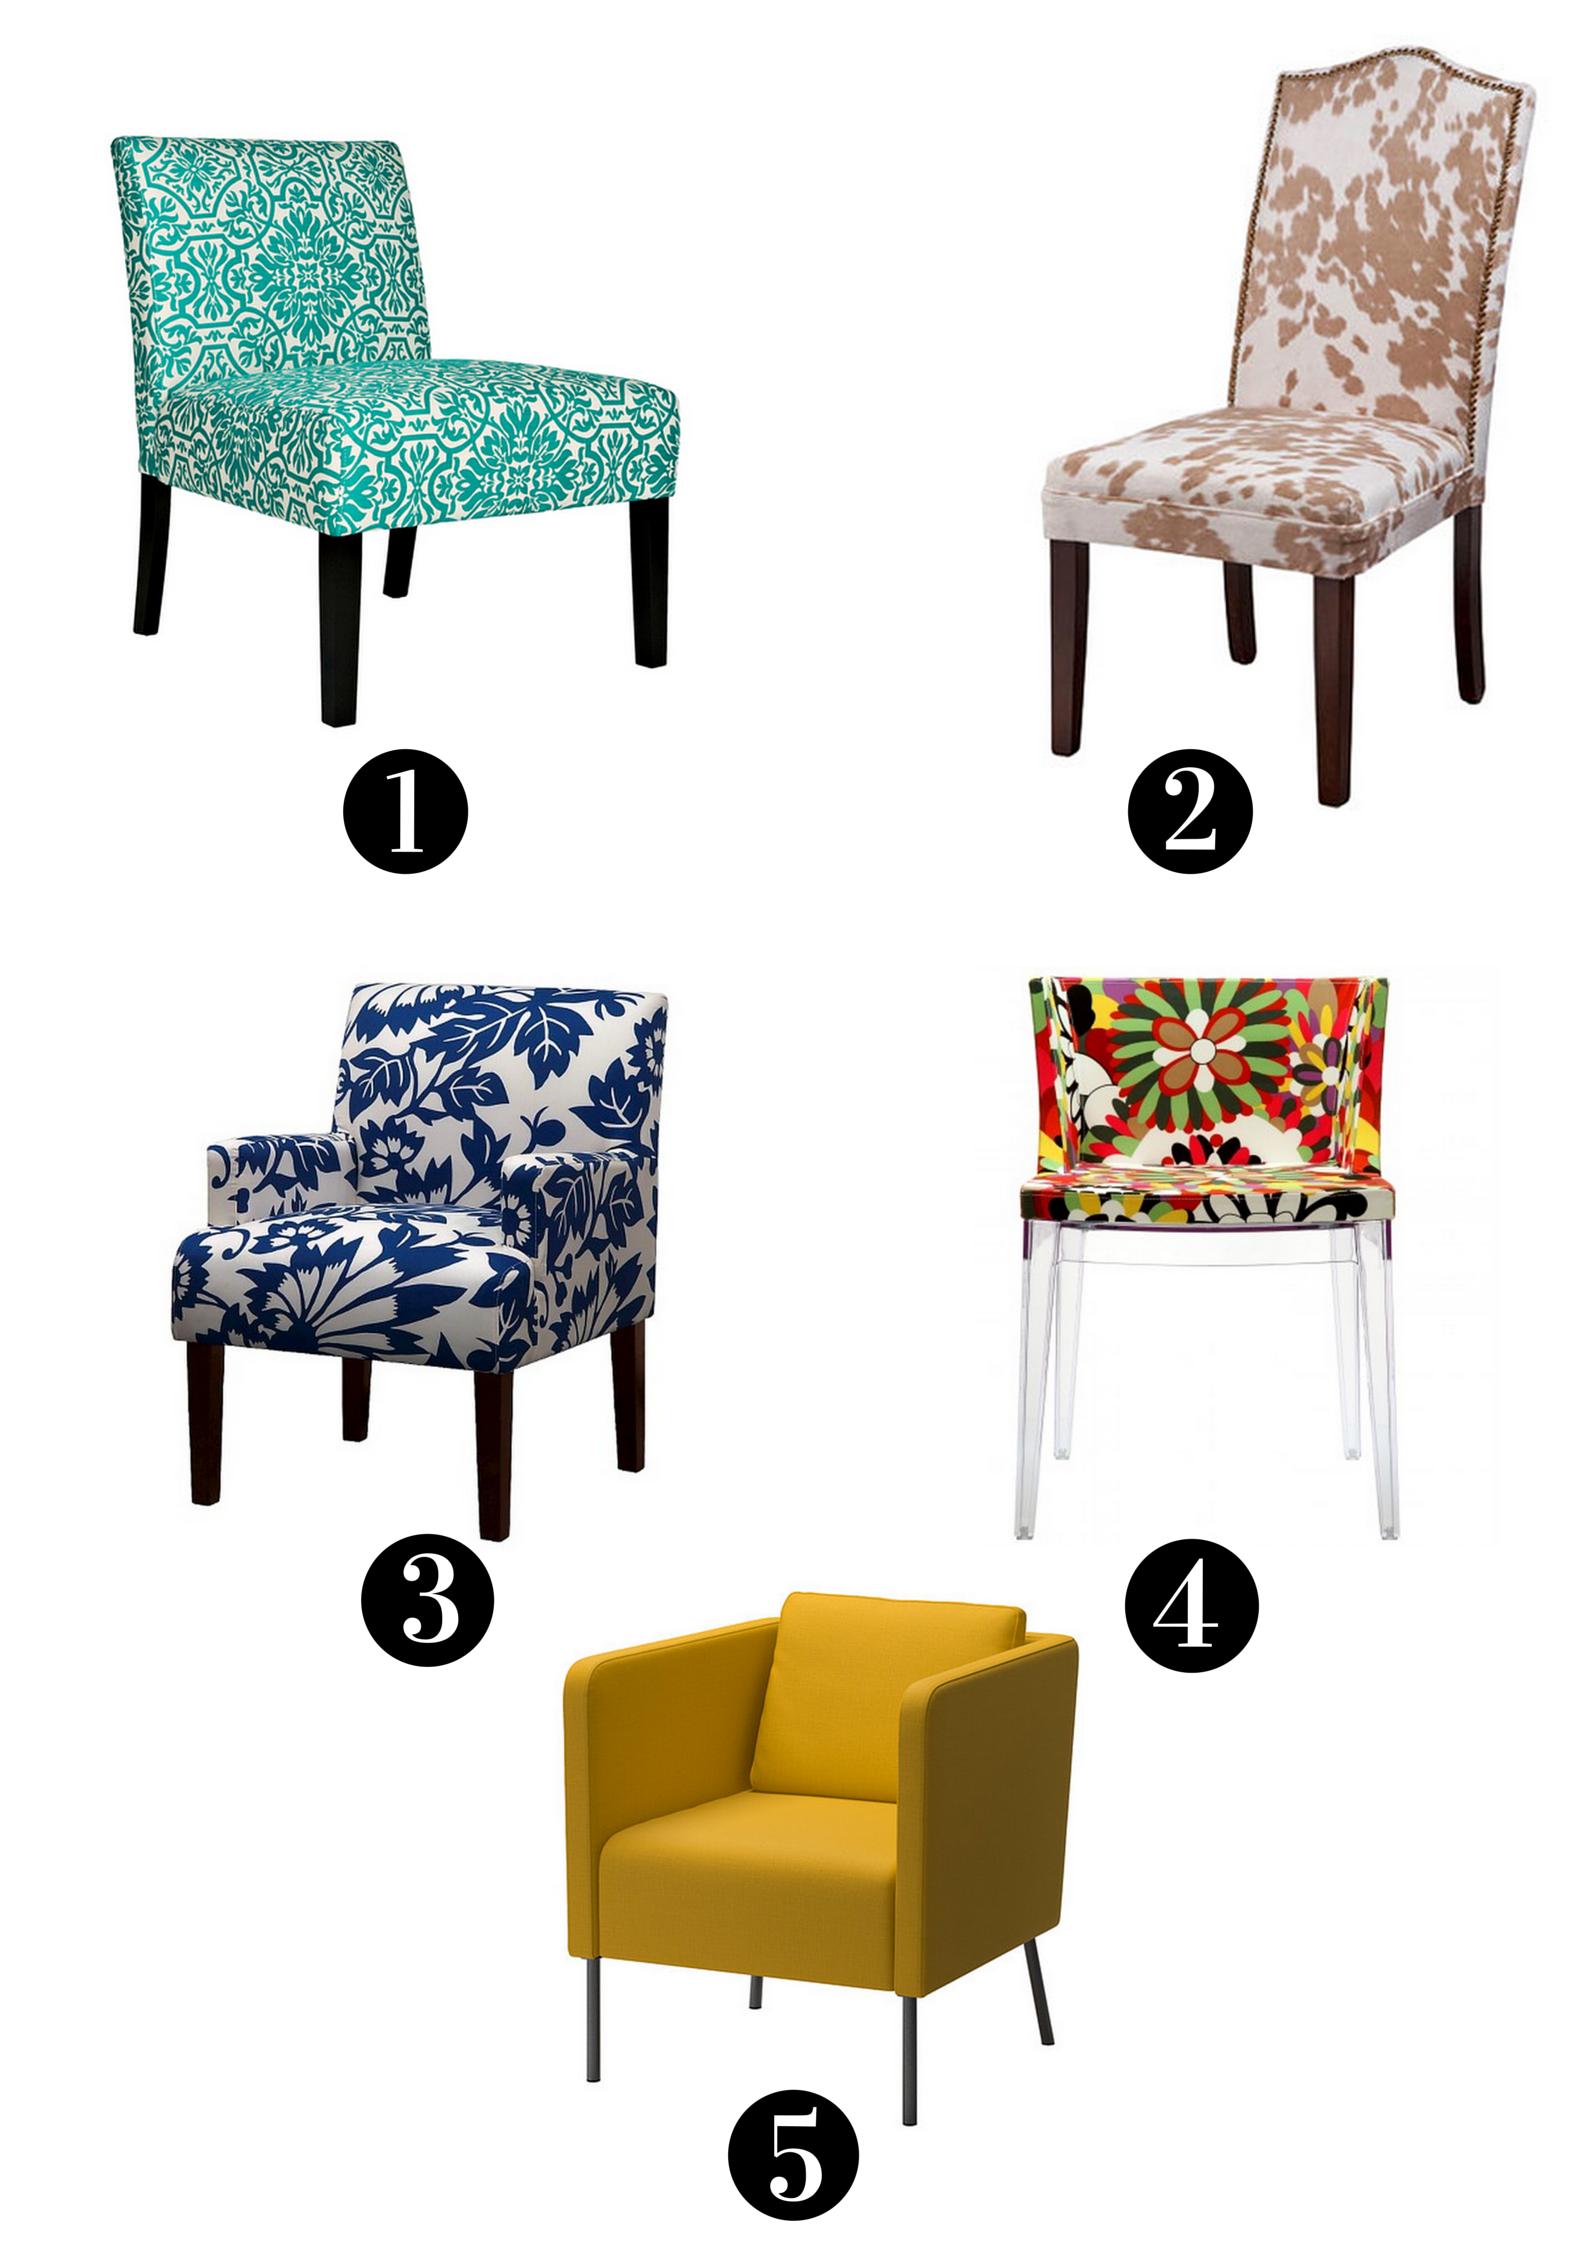 5 Chairs Under 150